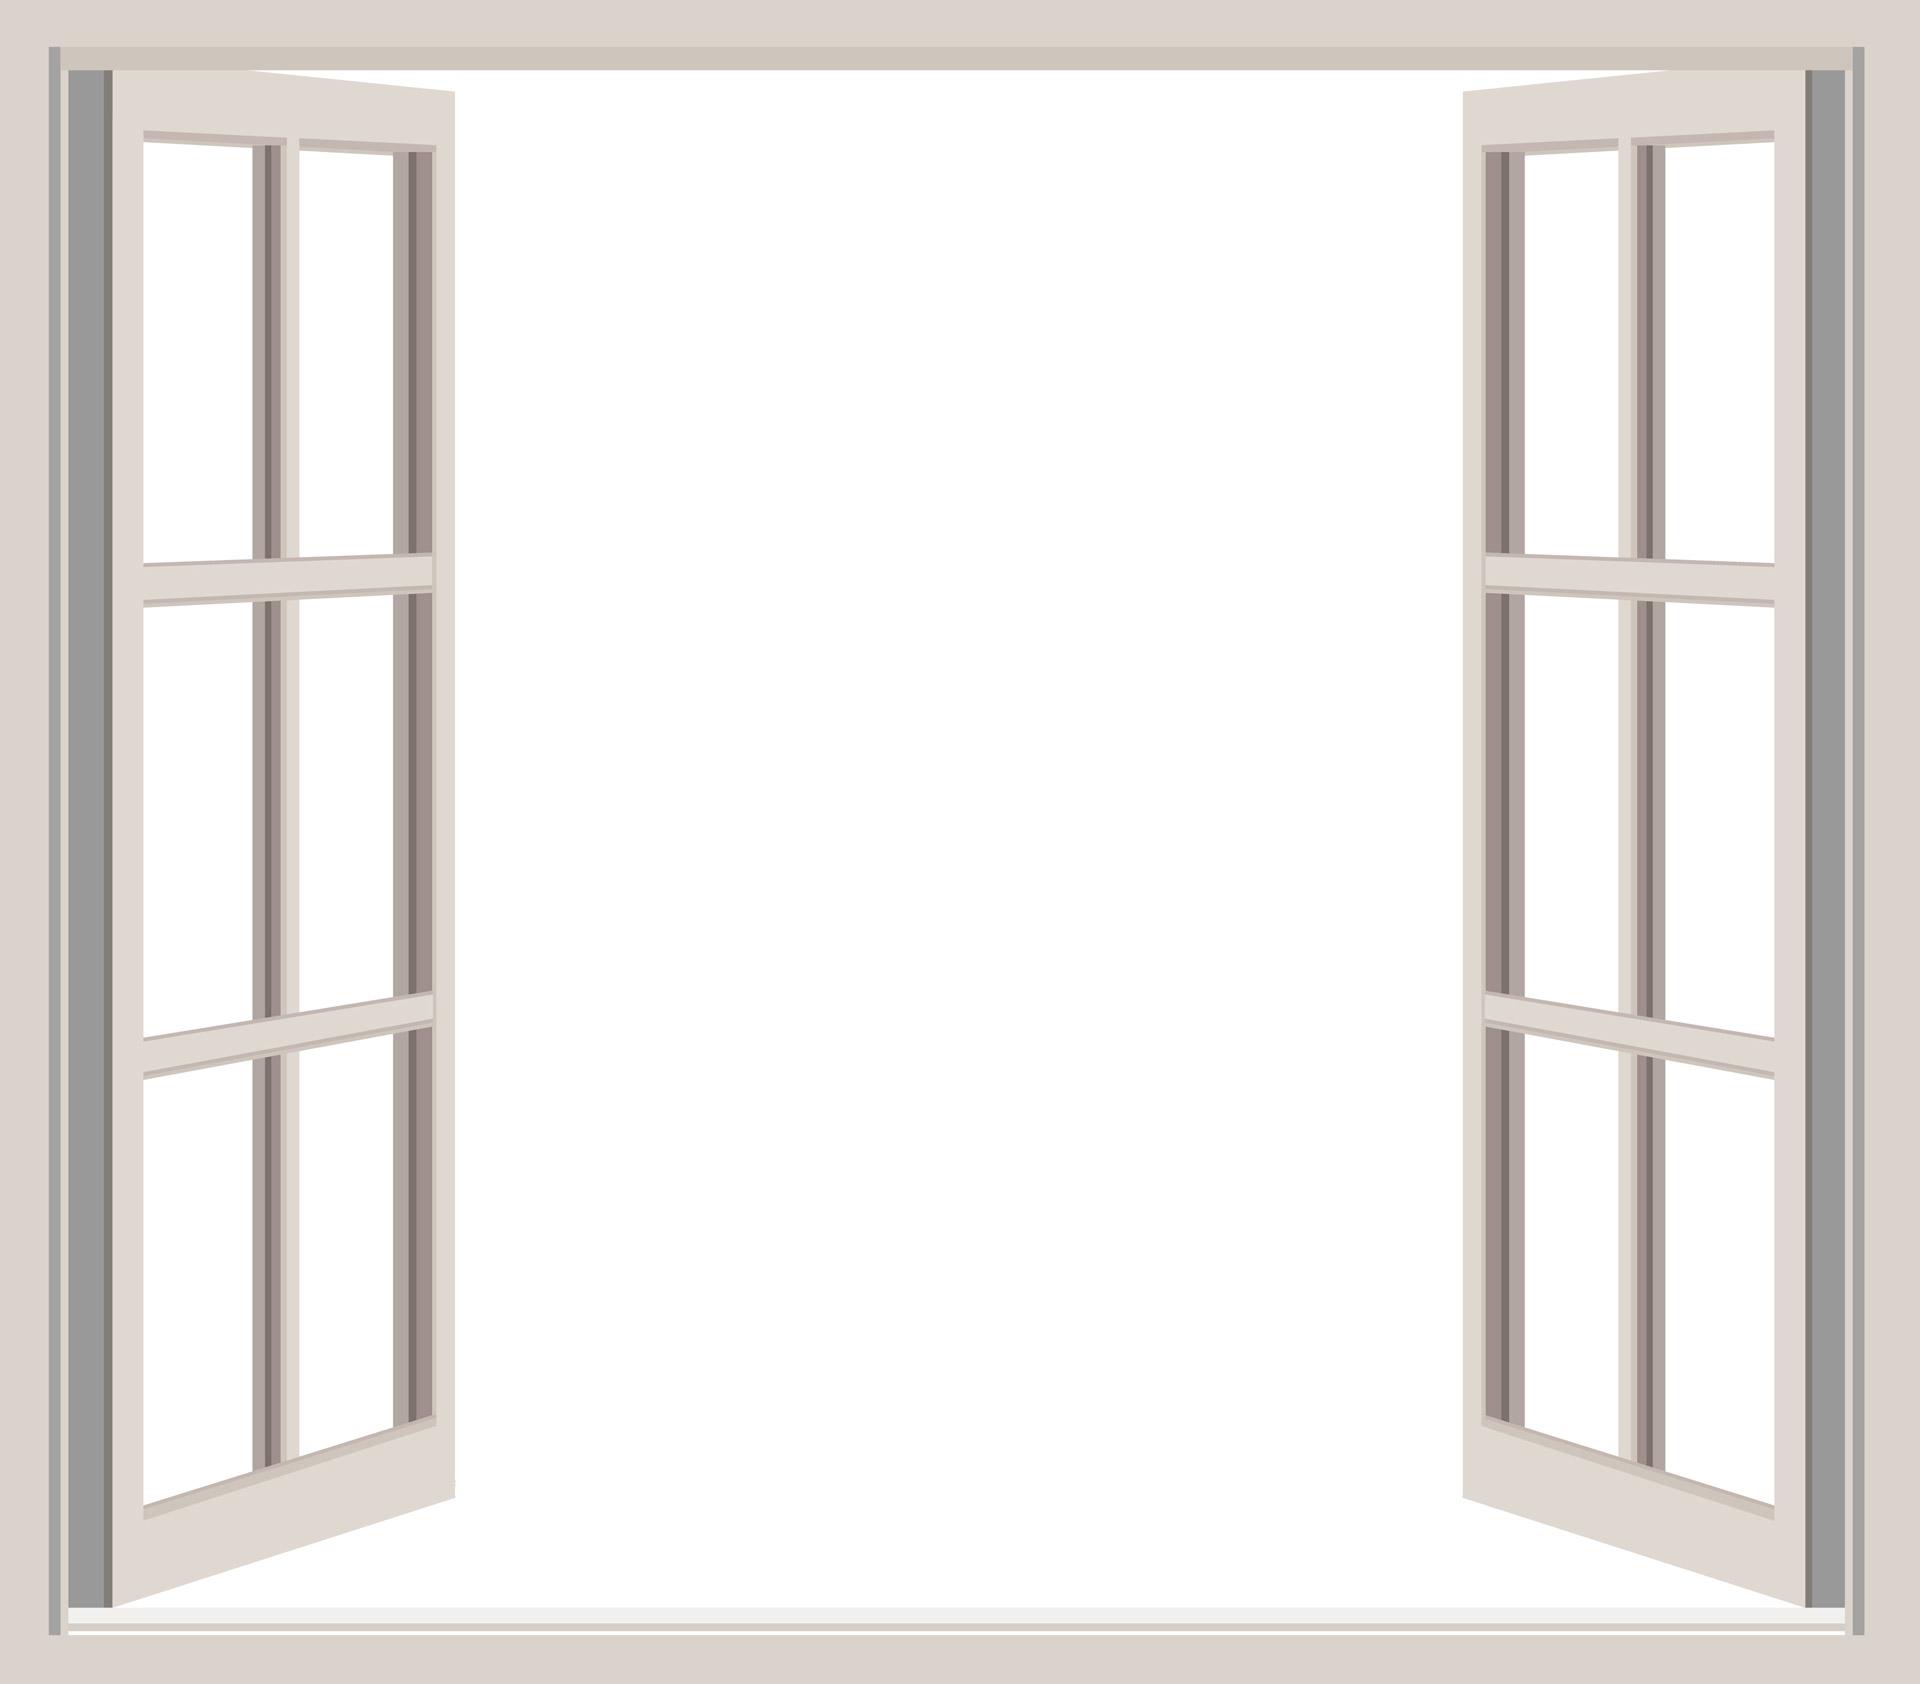 window sill clipart - Window Frames